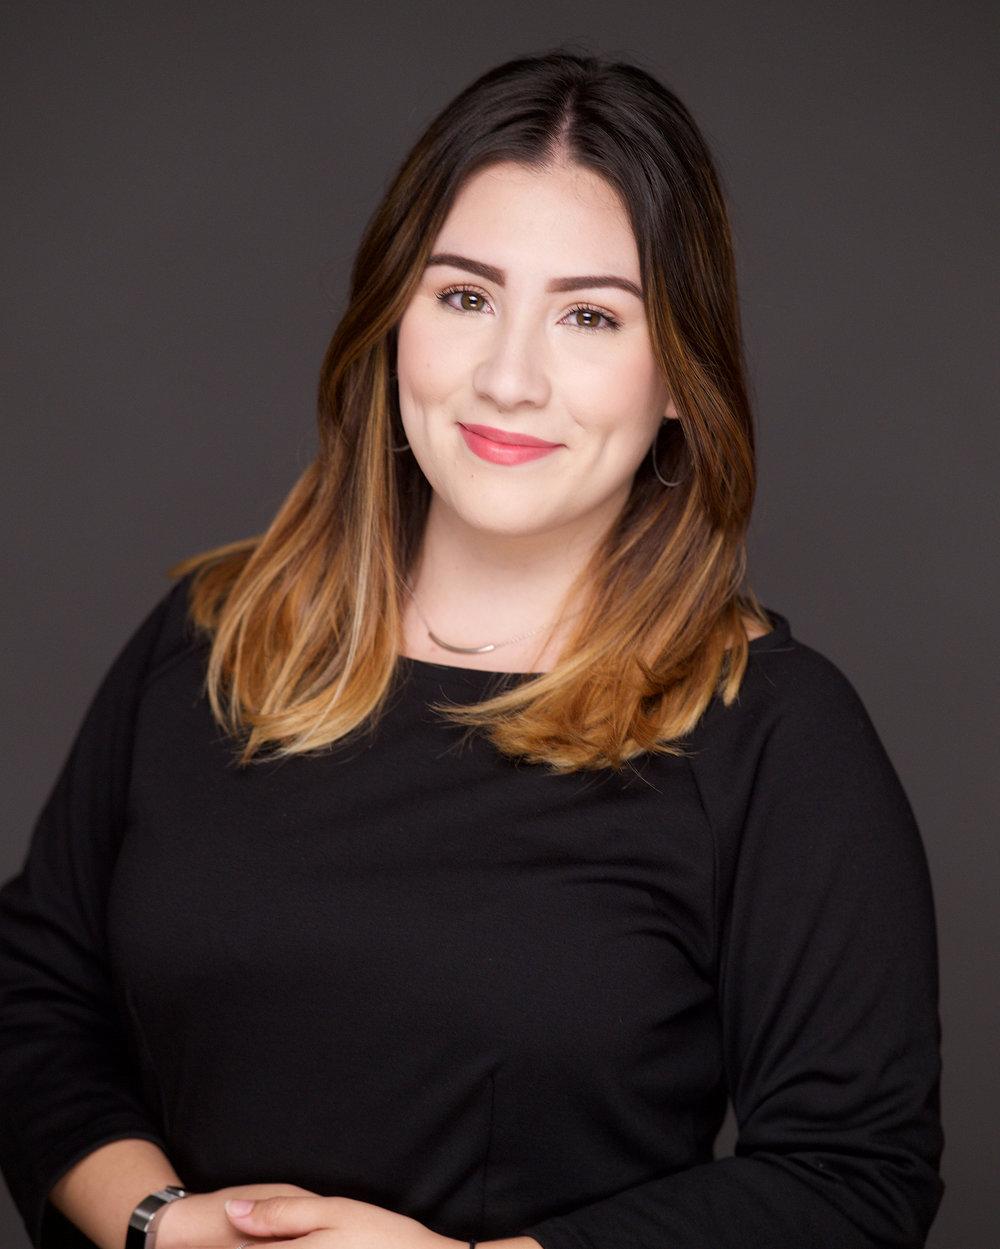 Mónica González - Administrative Assistant